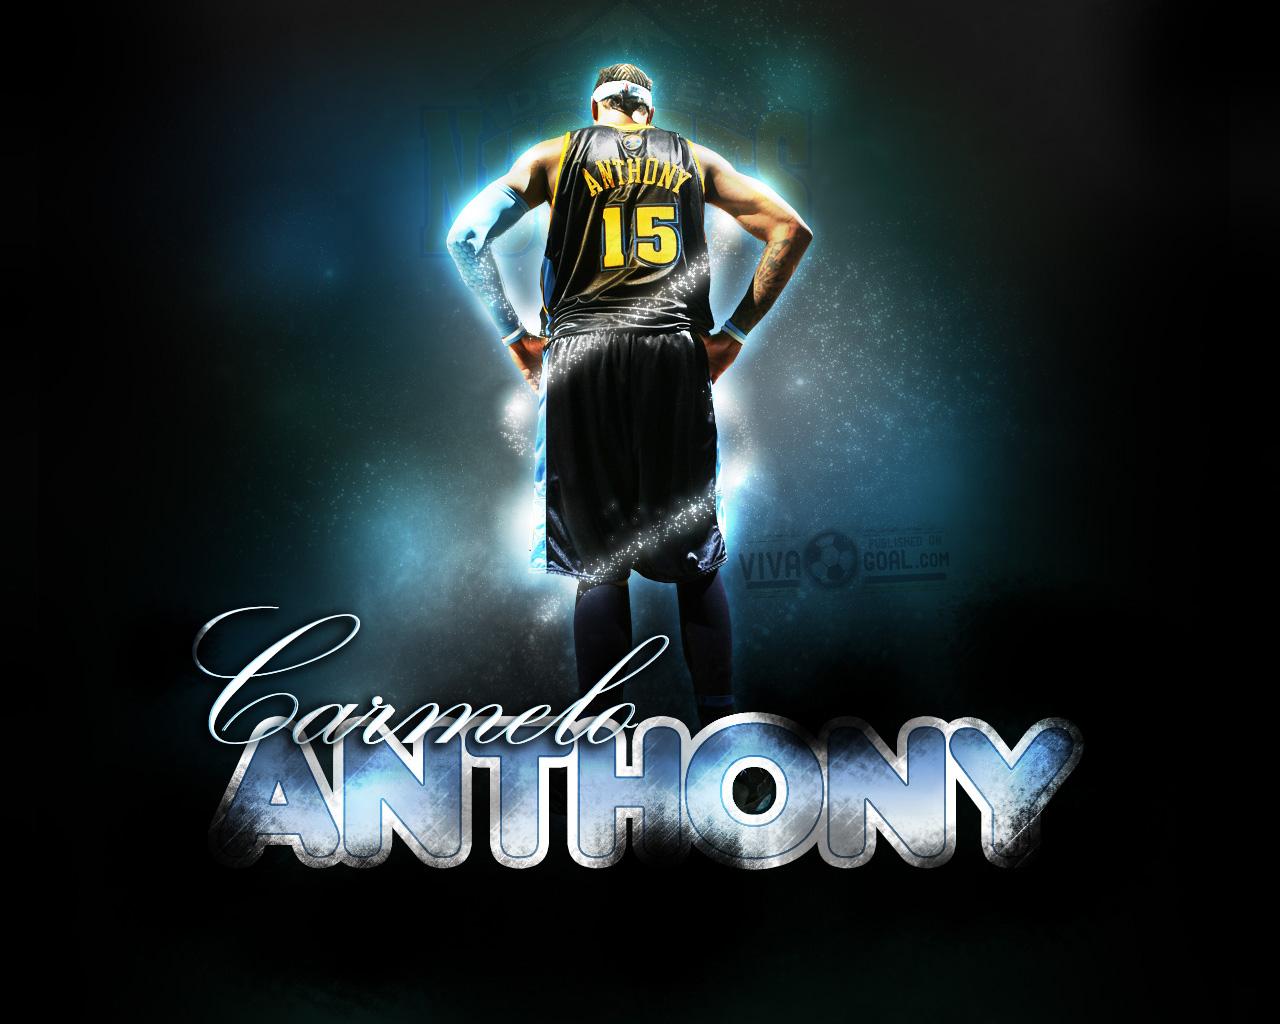 http://1.bp.blogspot.com/-vF-NVHK39-s/T_n4foRBmQI/AAAAAAAAMNw/lzozpOU8huE/s1600/carmelo_anthony_basketball_wallpaper.jpg